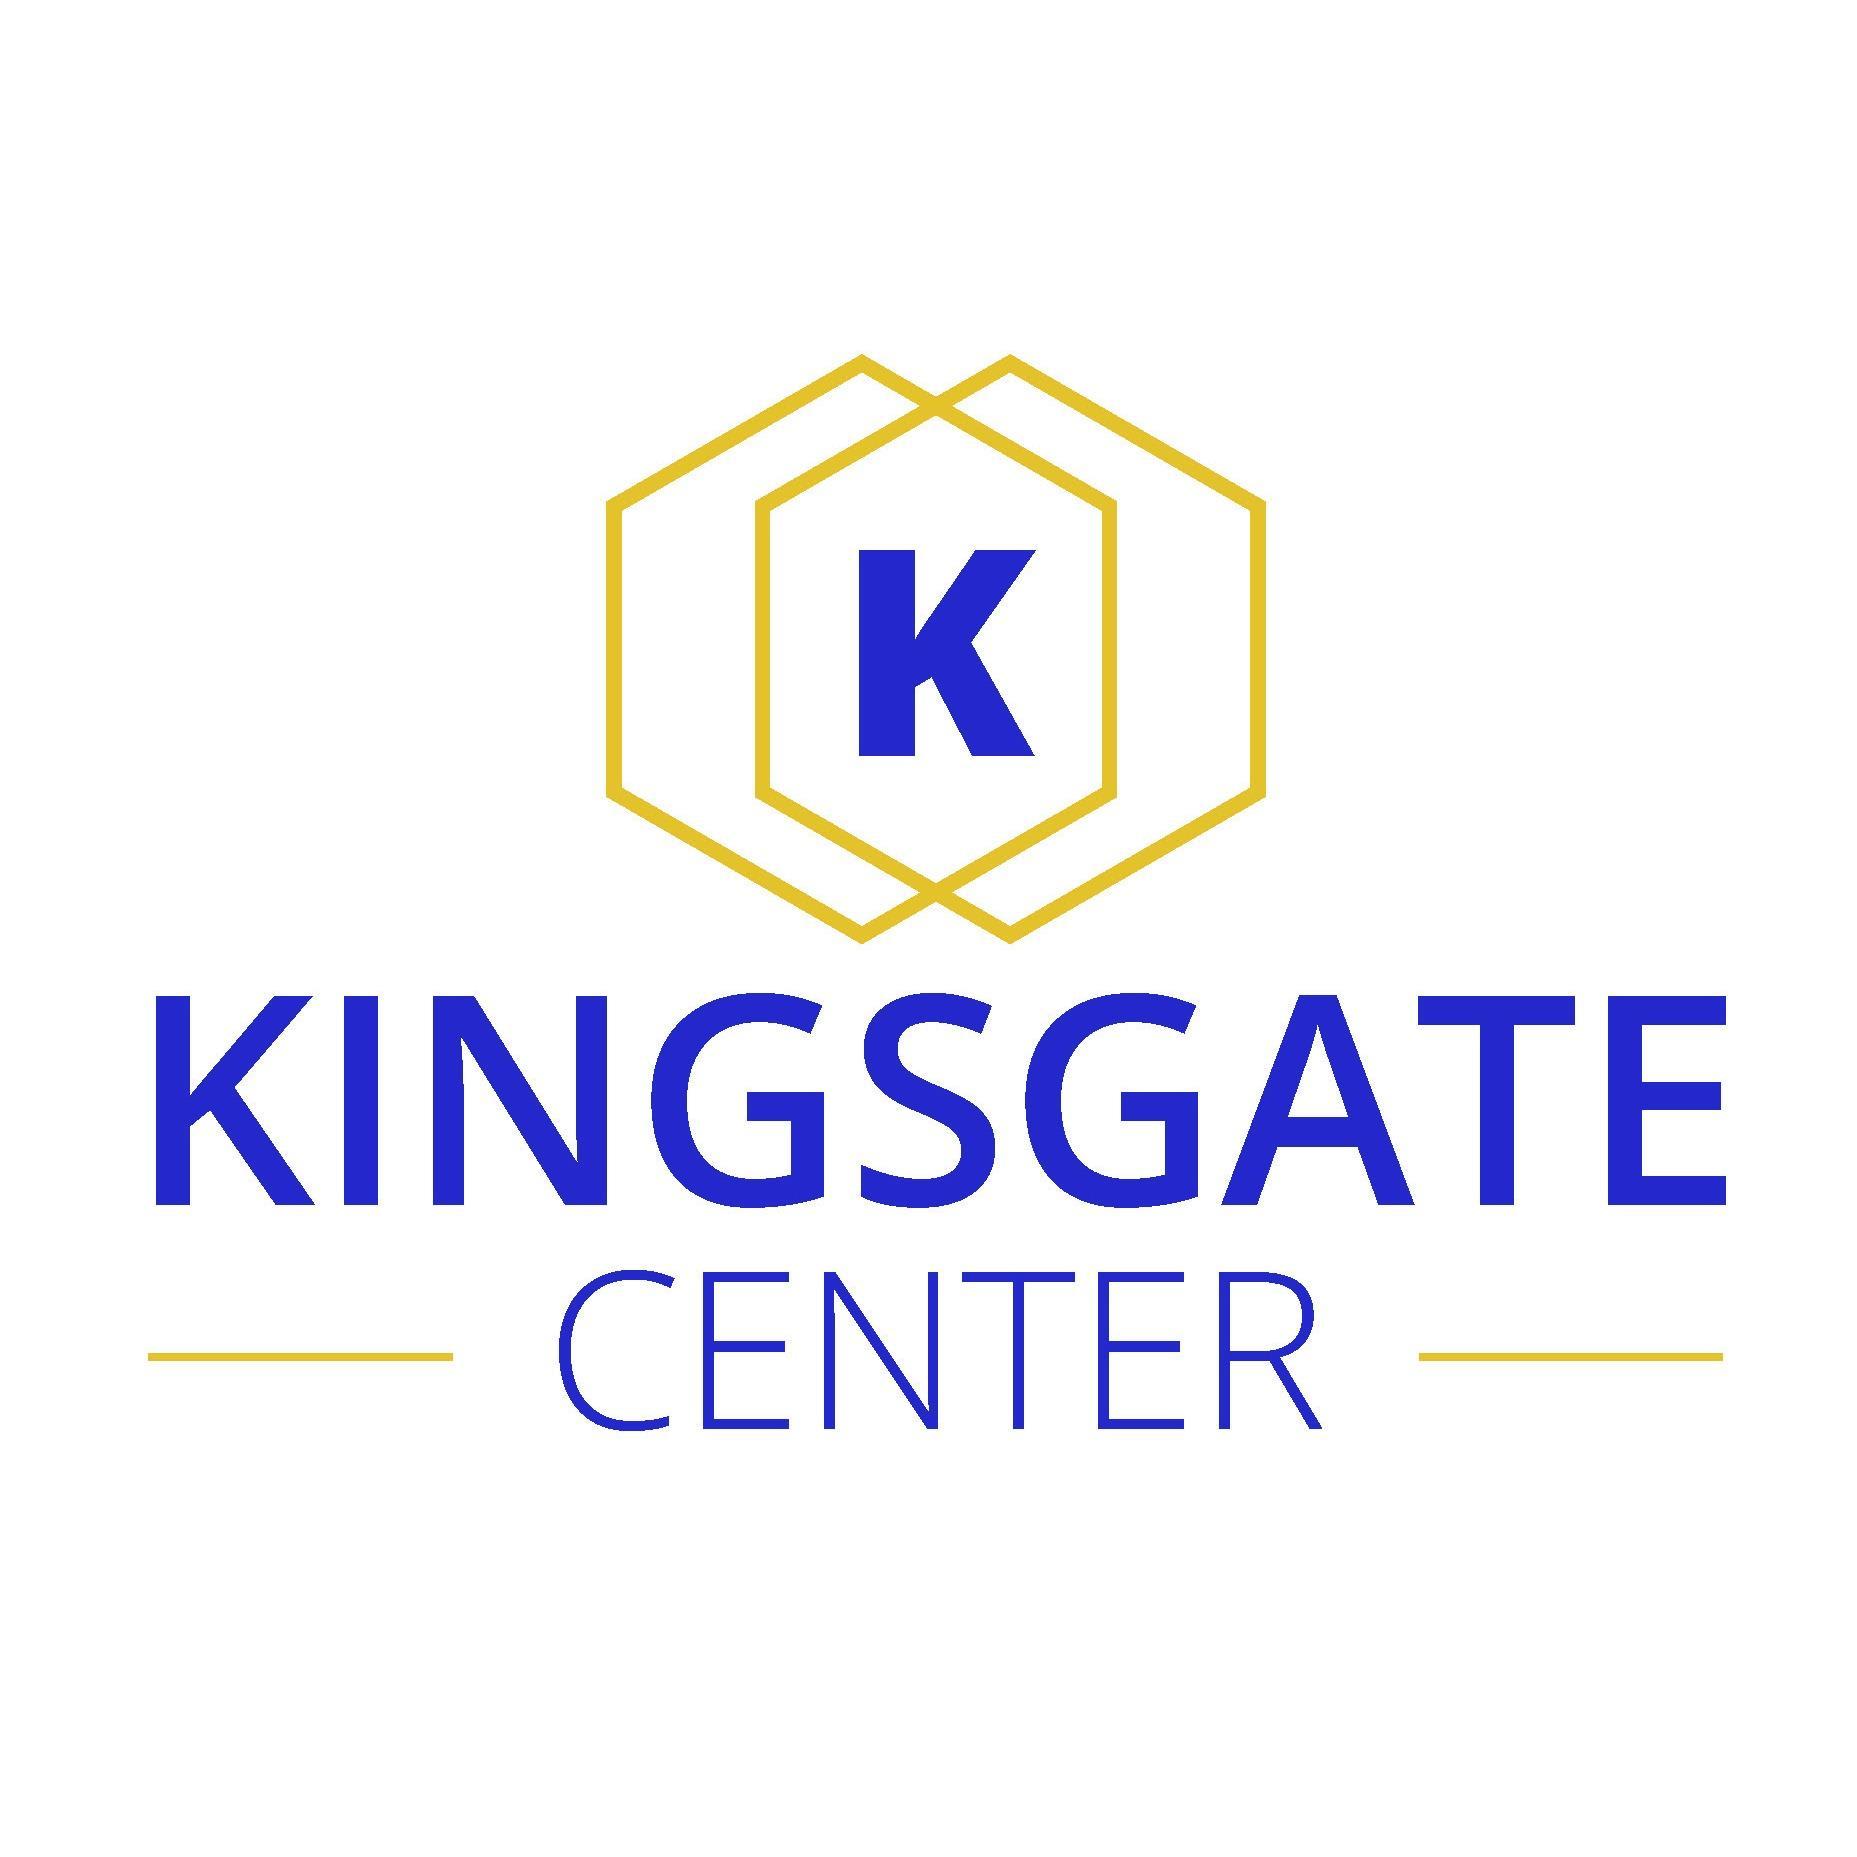 Kingsgate Center Office Condo Association image 0